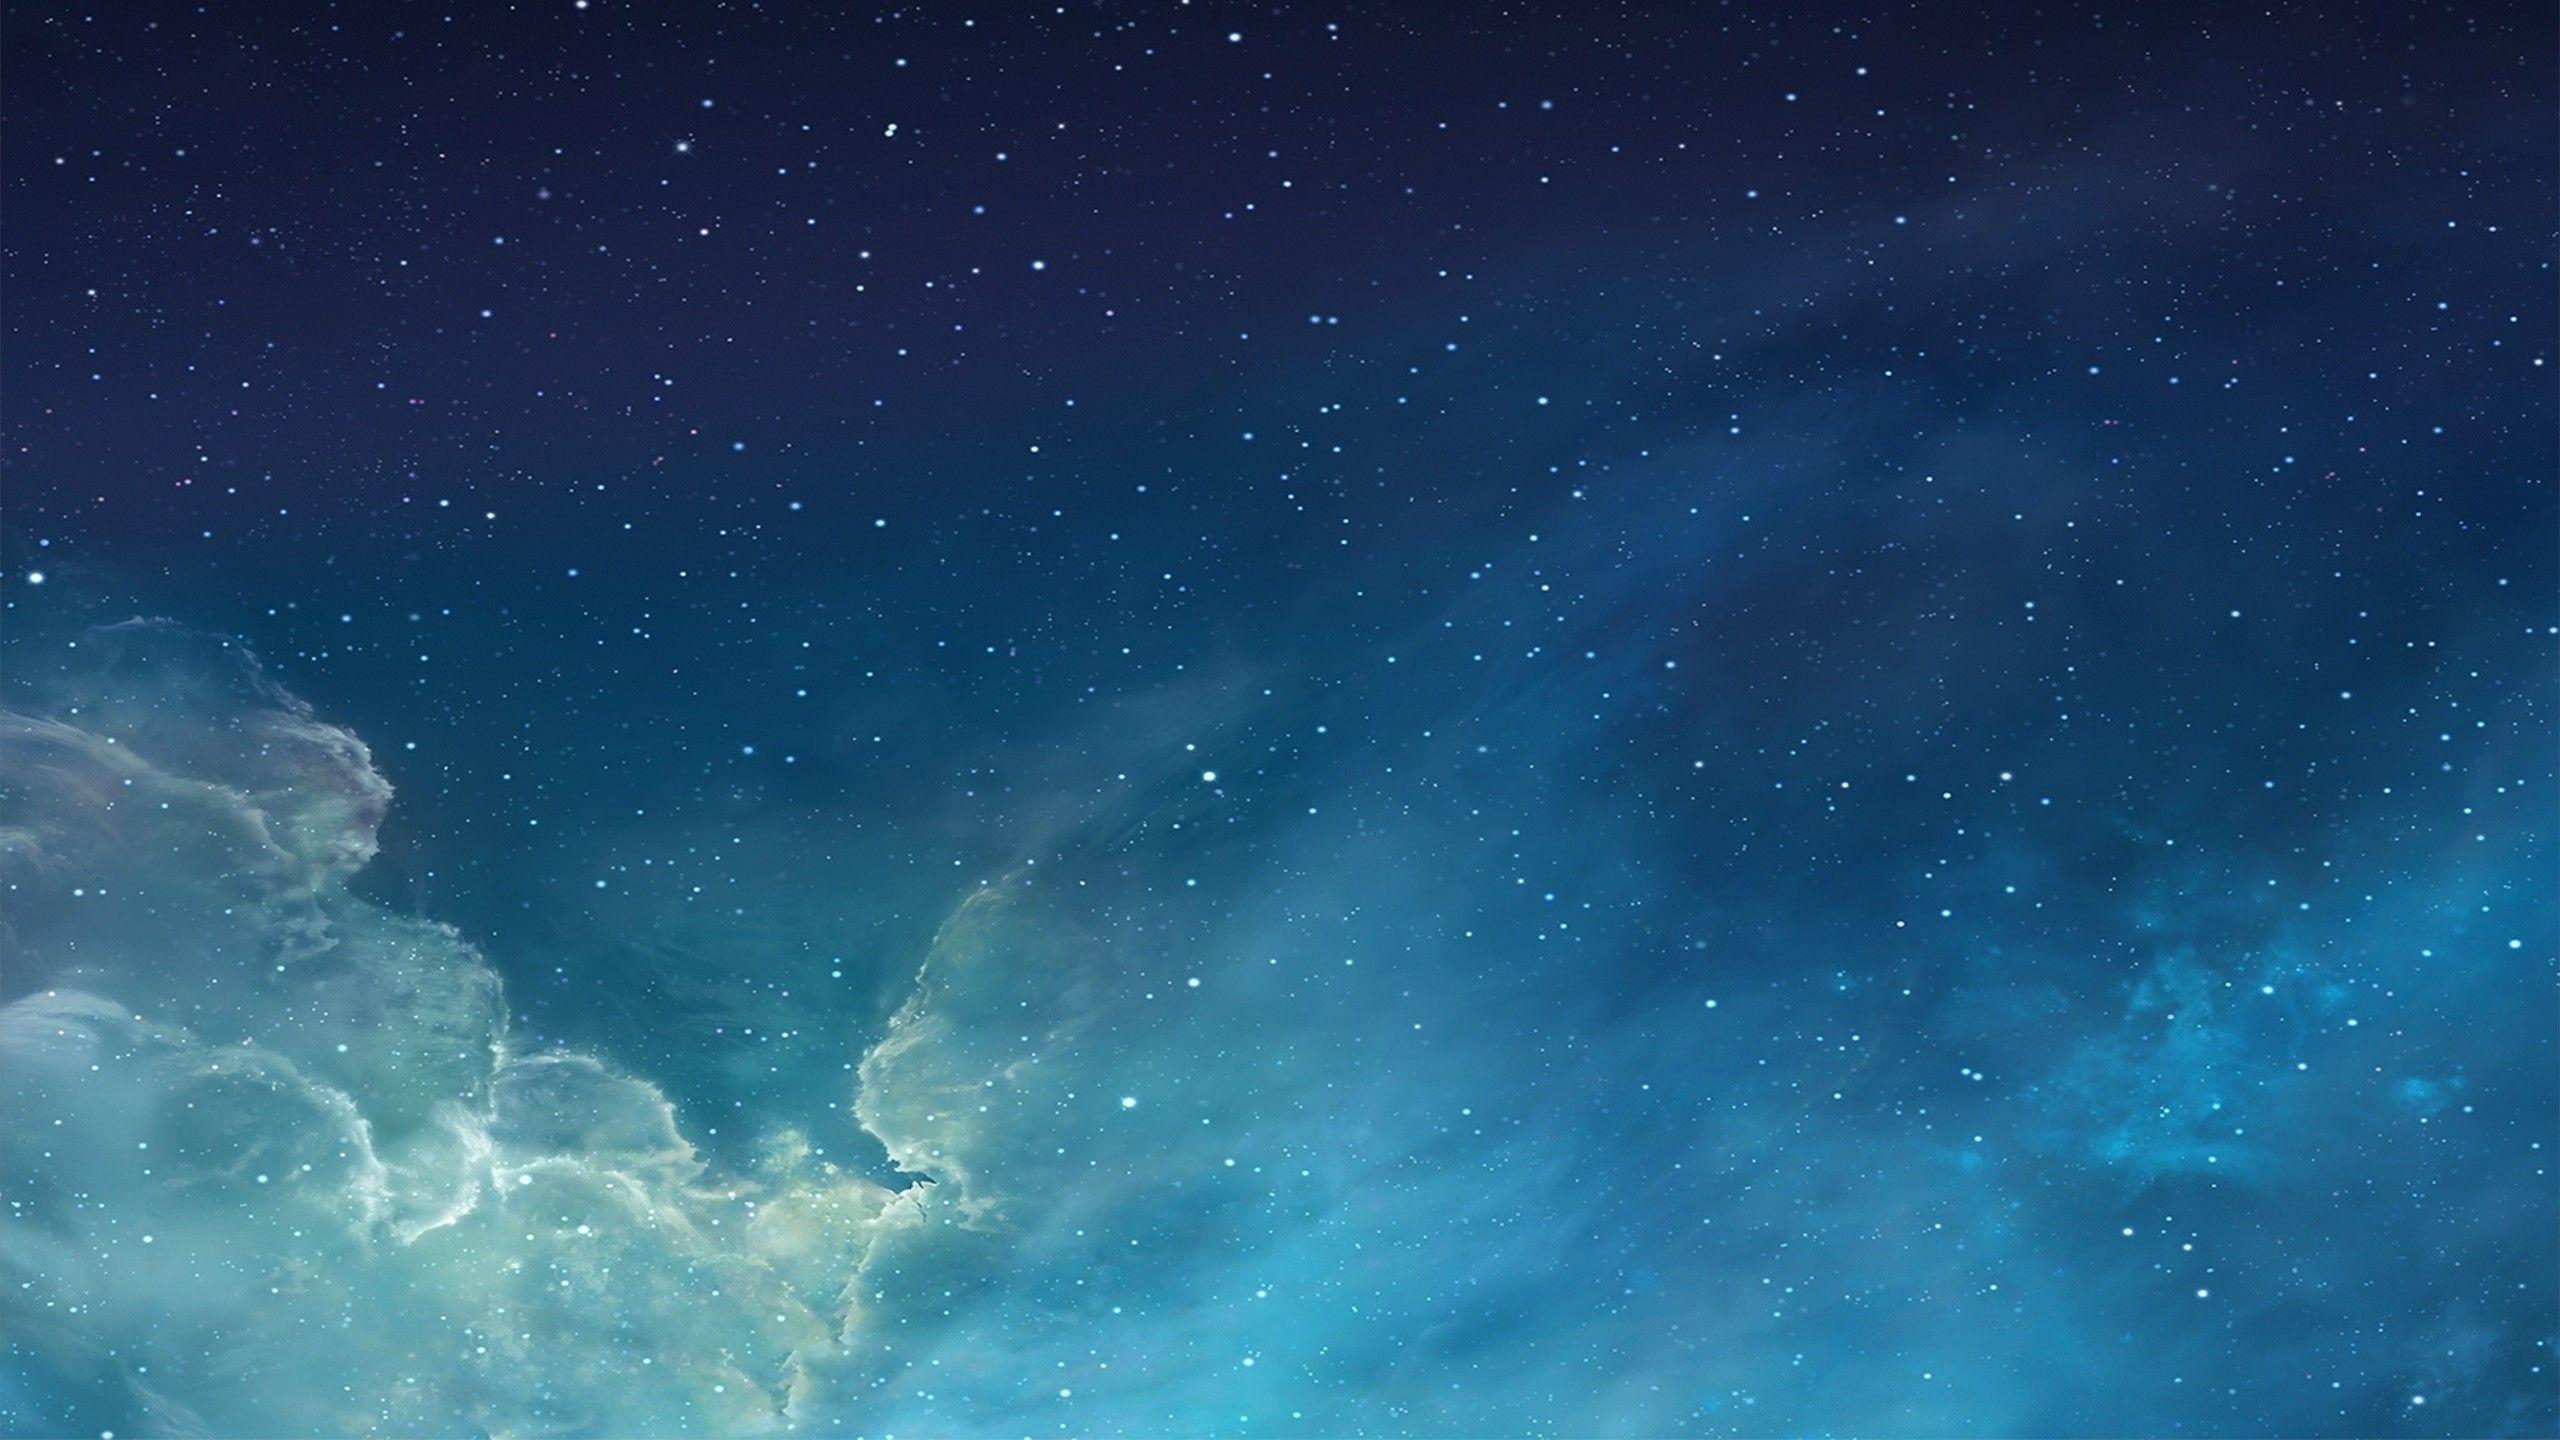 stars in the sky wallpaper # | bright blue day | pinterest | star